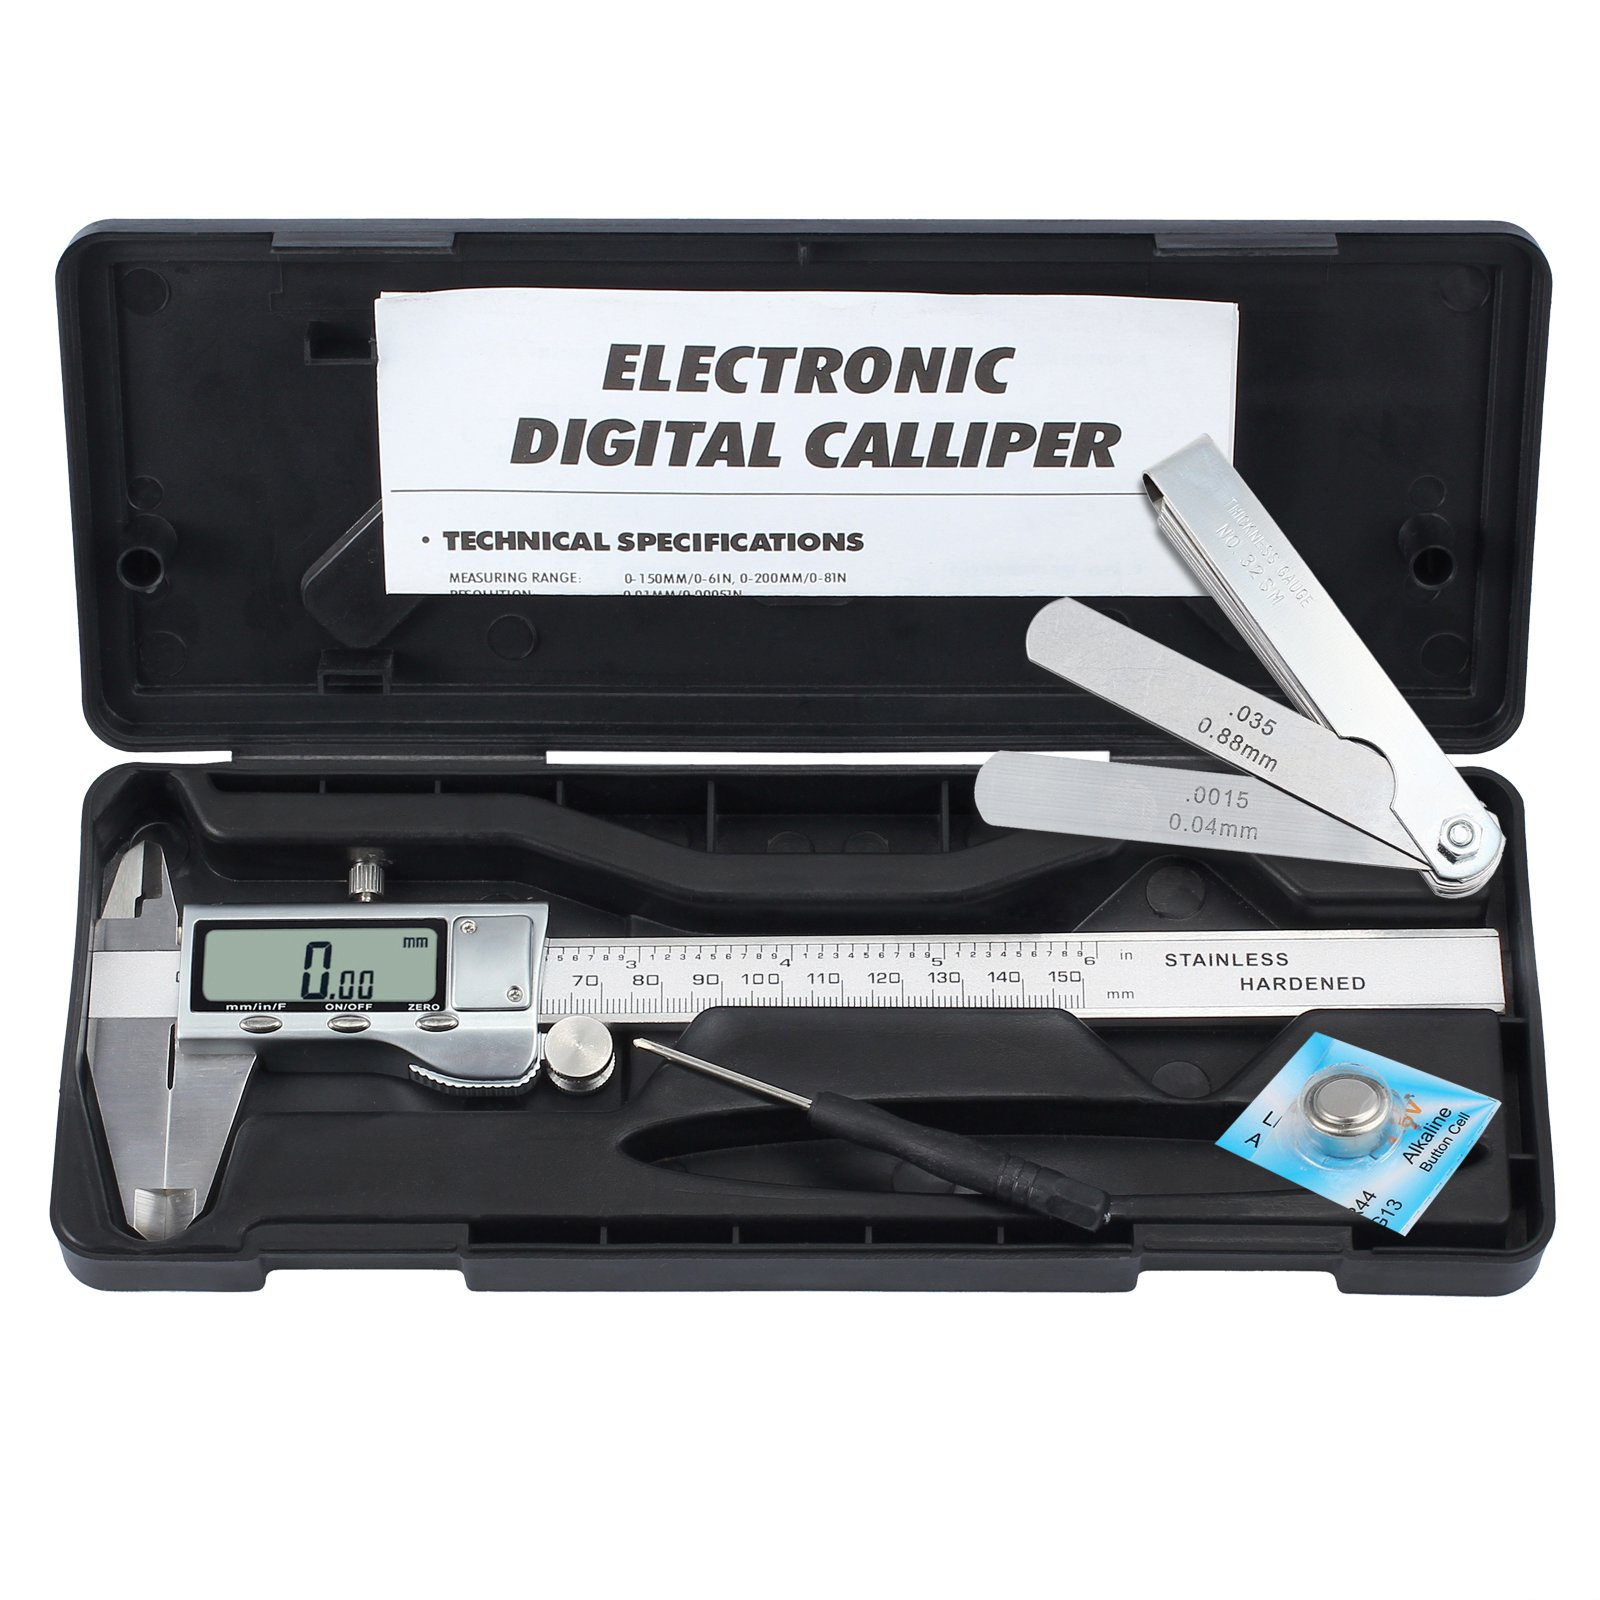 Digital Vernier Caliper + Feeler Gauge Neoteck 150mm/6Inch Stainless Steel Electronic Caliper Fractions/Inch/Metric Conversion Measuring Tool for Length Width Depth Inner Diameter Outer Diameter by Neoteck (Image #7)